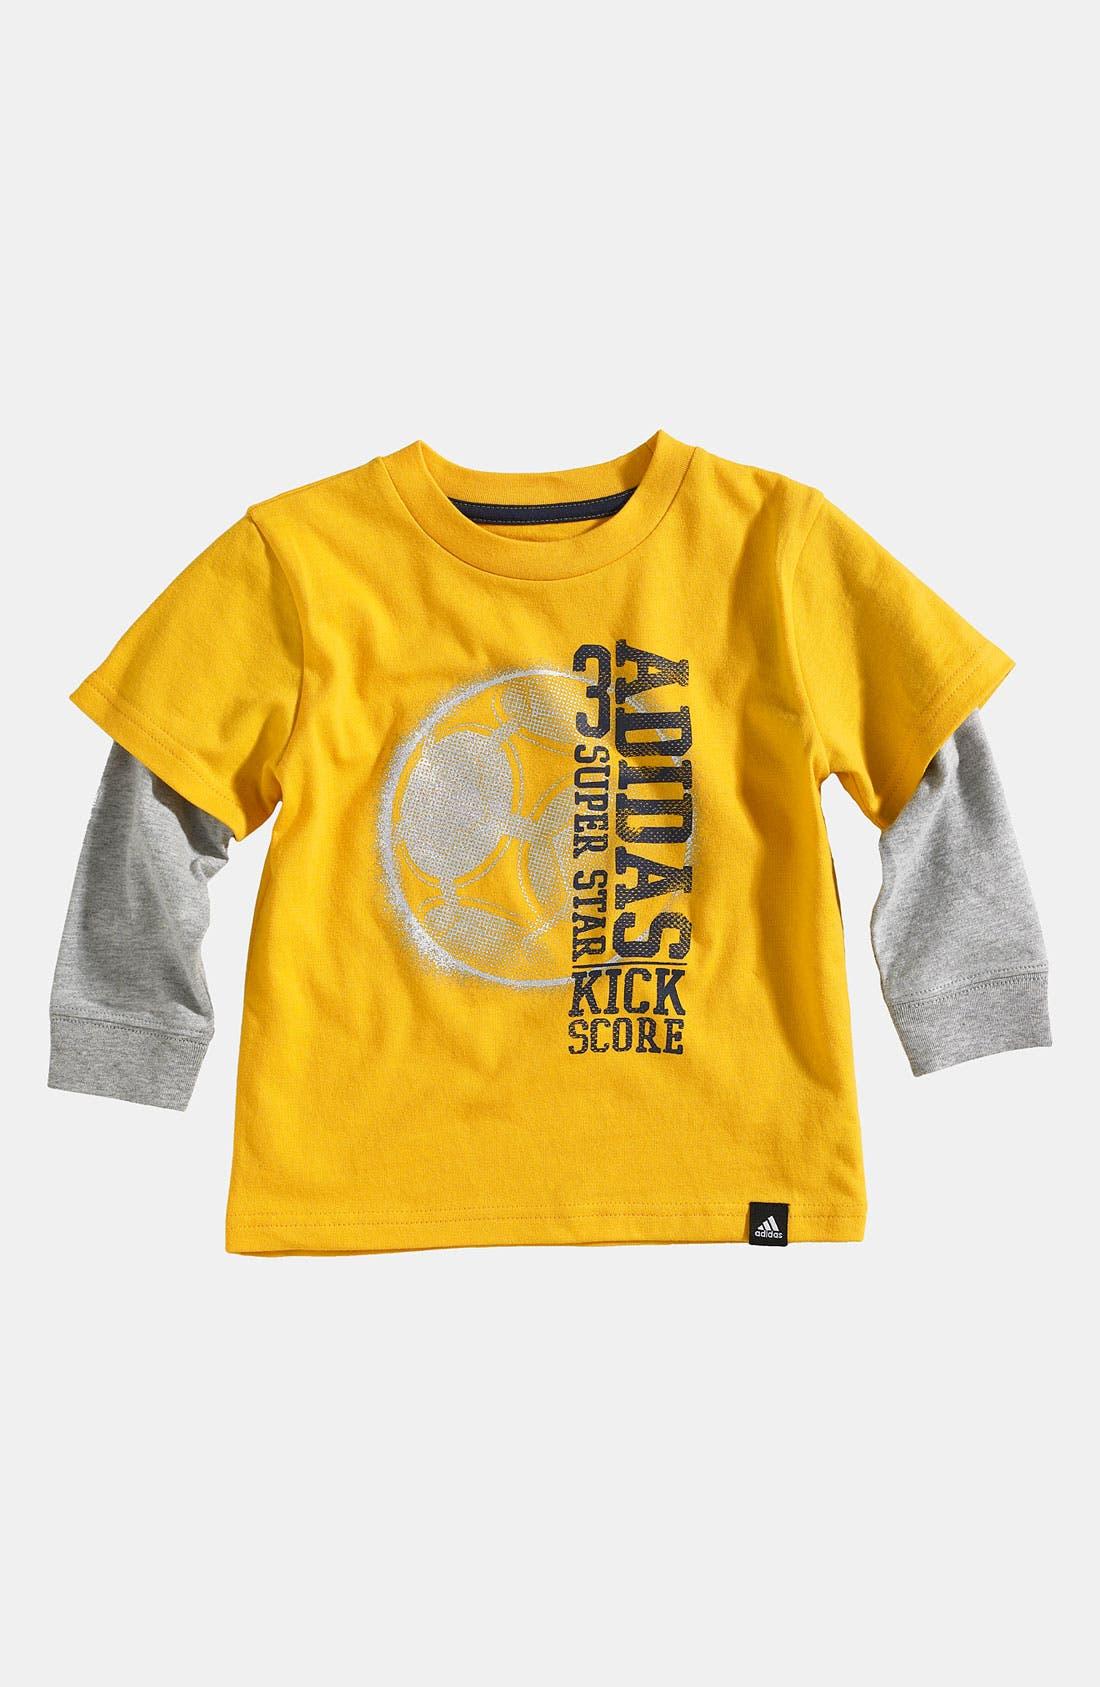 Main Image - adidas 'Triple Score' T-Shirt (Infant)